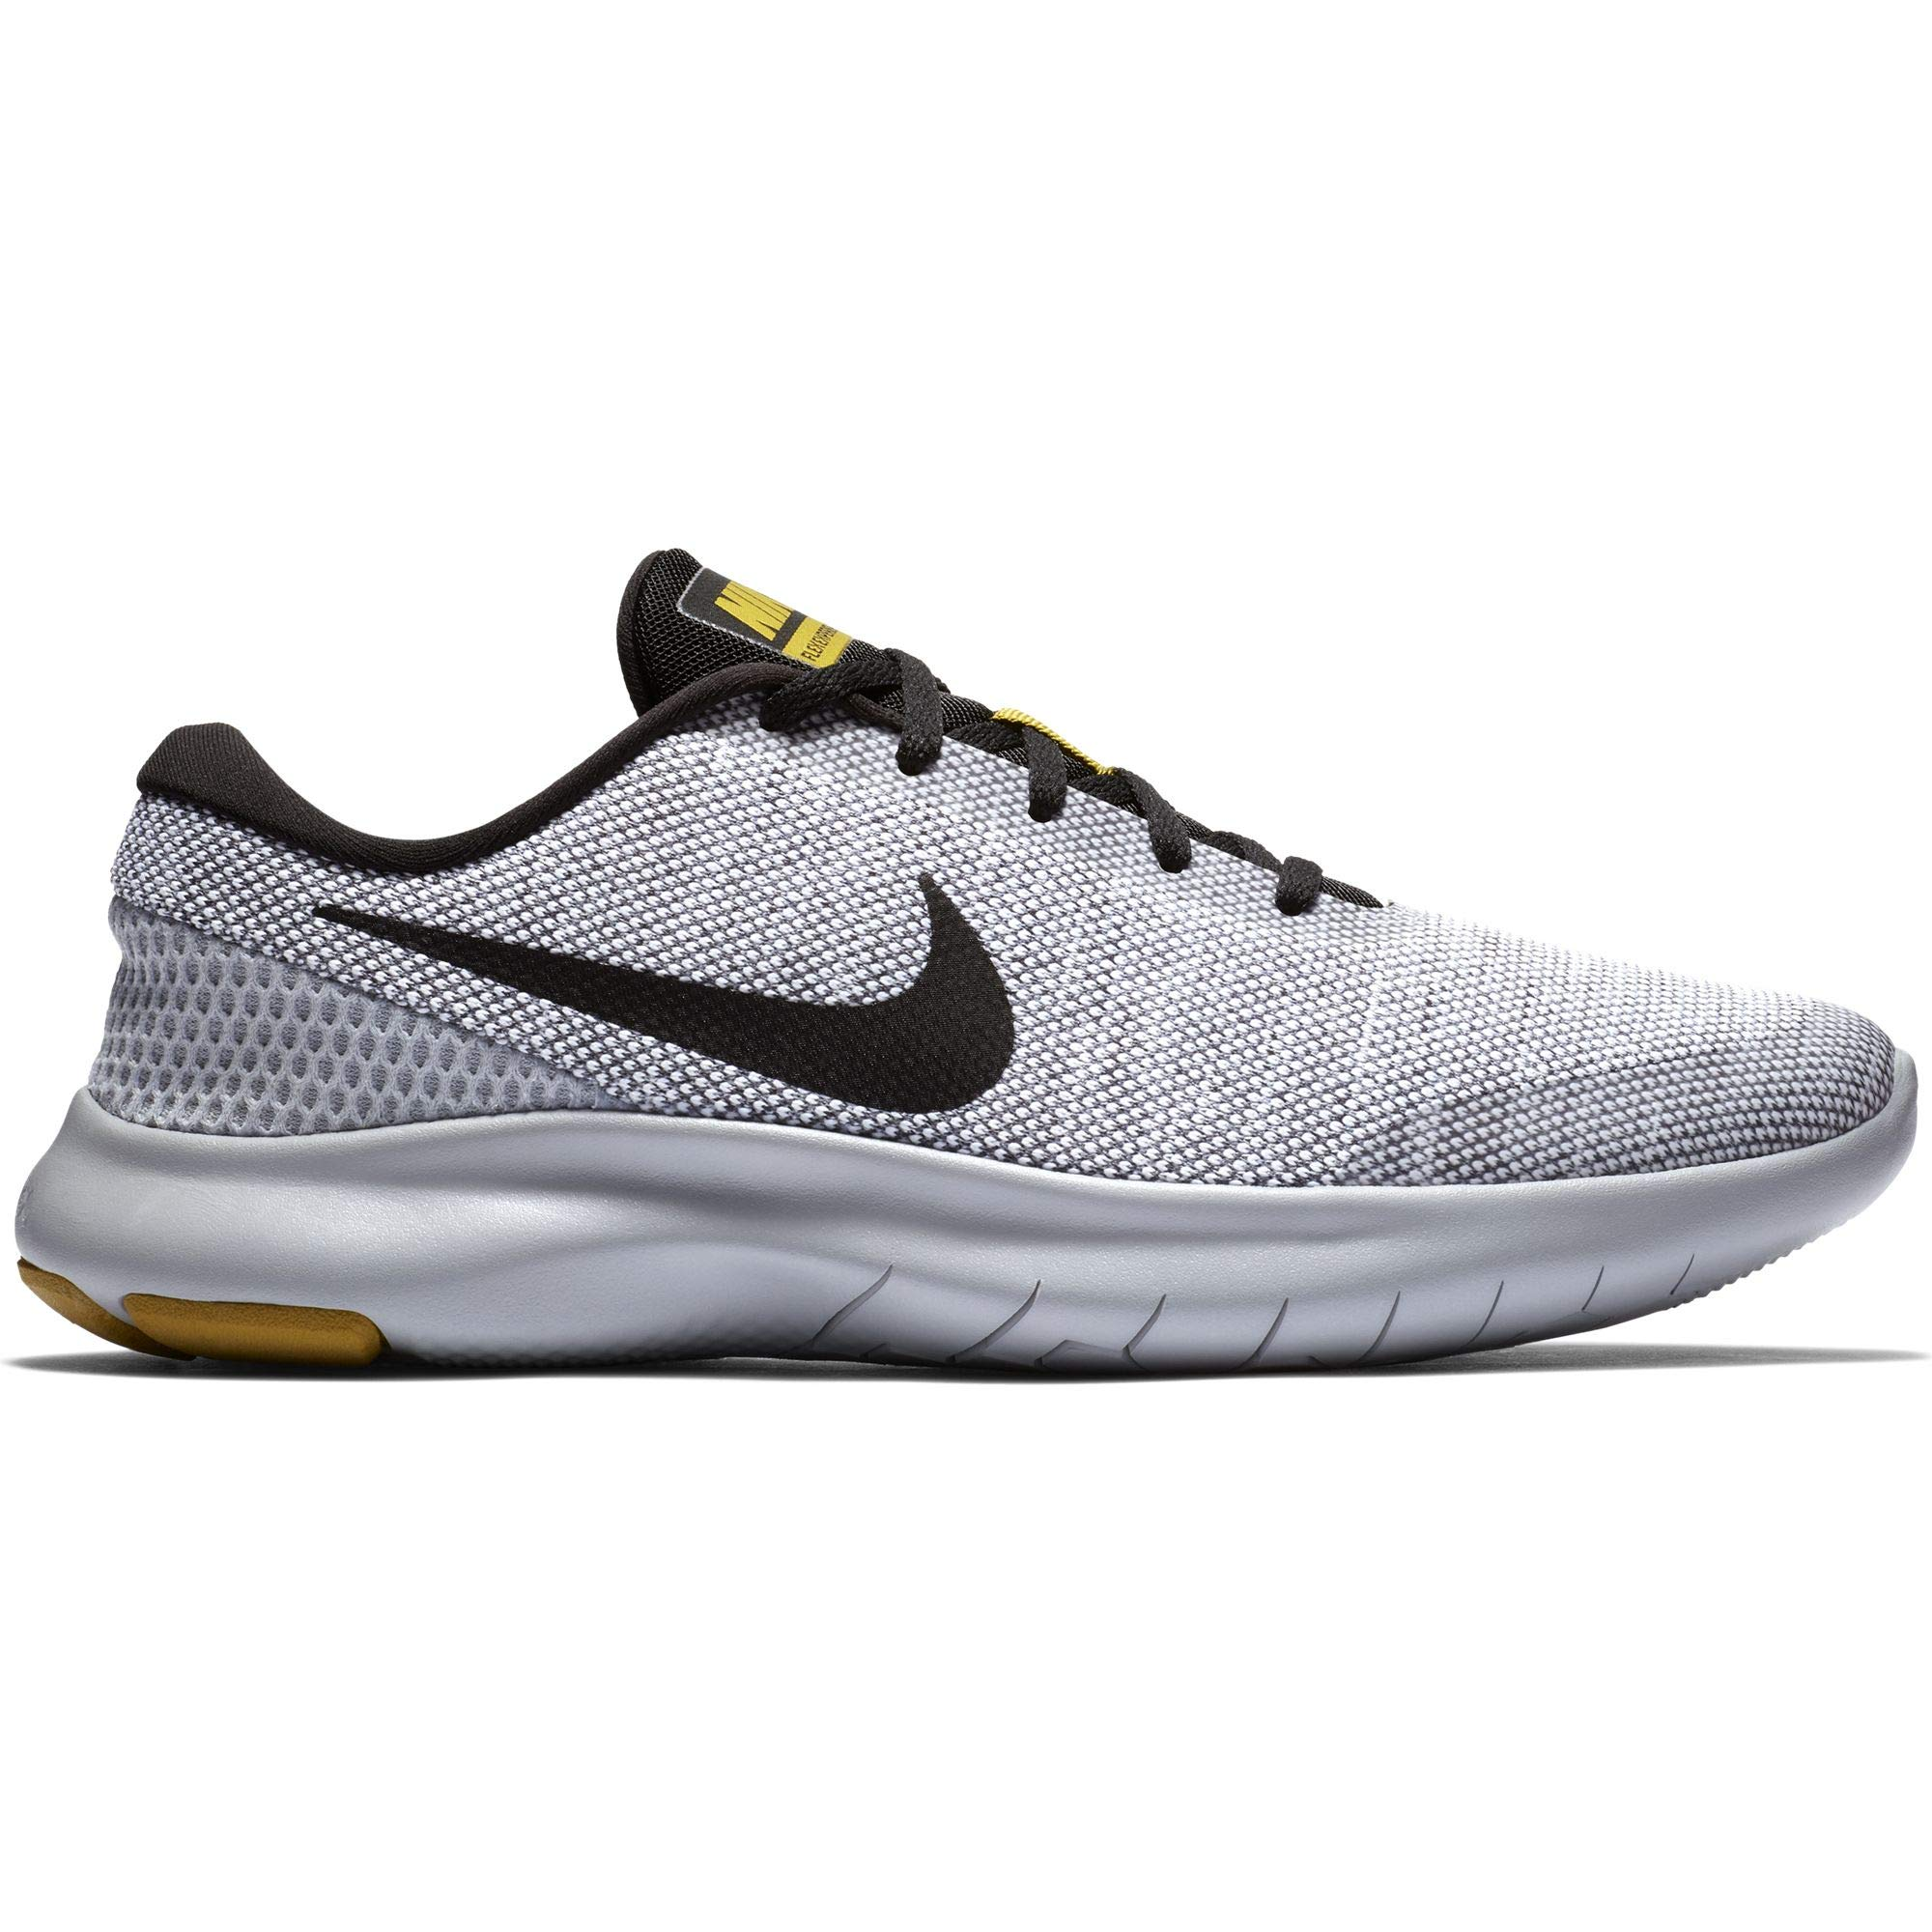 43acc1d3b8dc Galleon - Nike Men s Flex Experience RN 7 Running Shoe White Black Wolf Grey  Size 7.5 M US